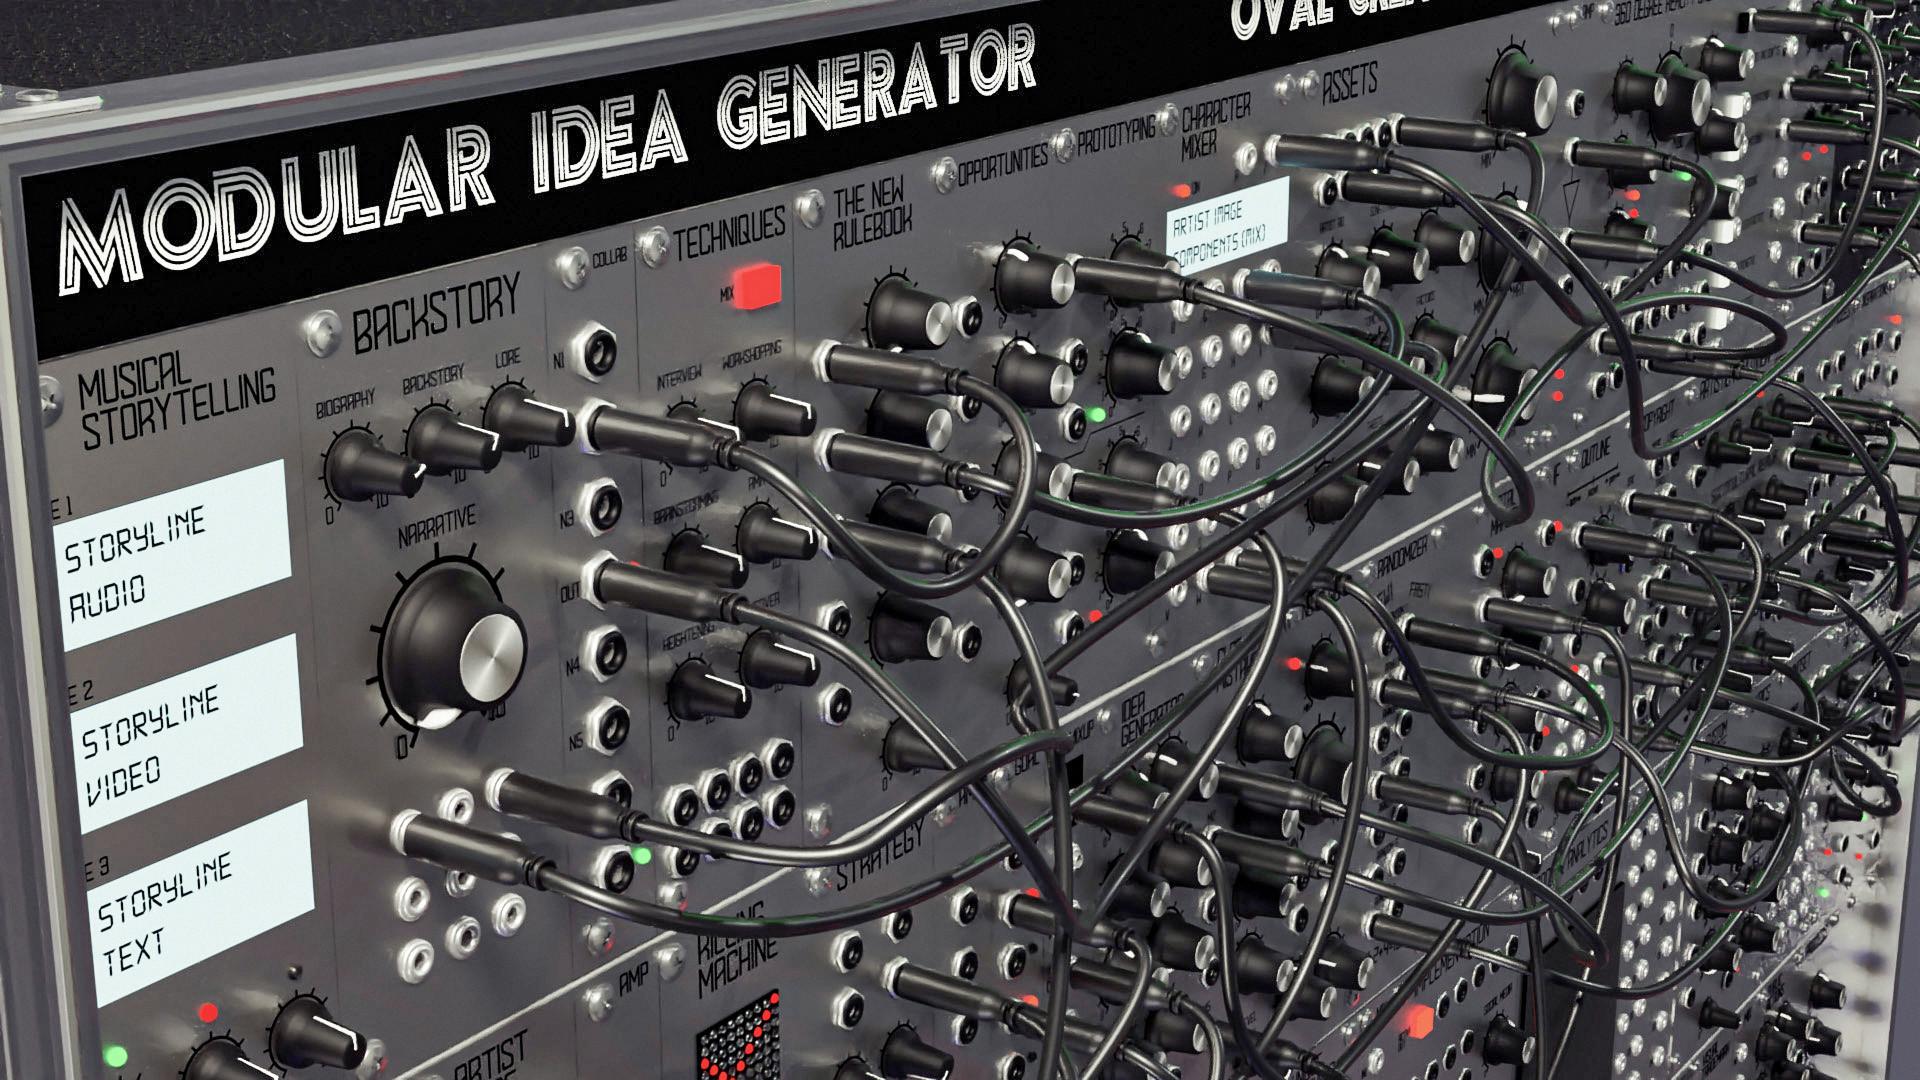 Modular Idea Generator 2.jpg